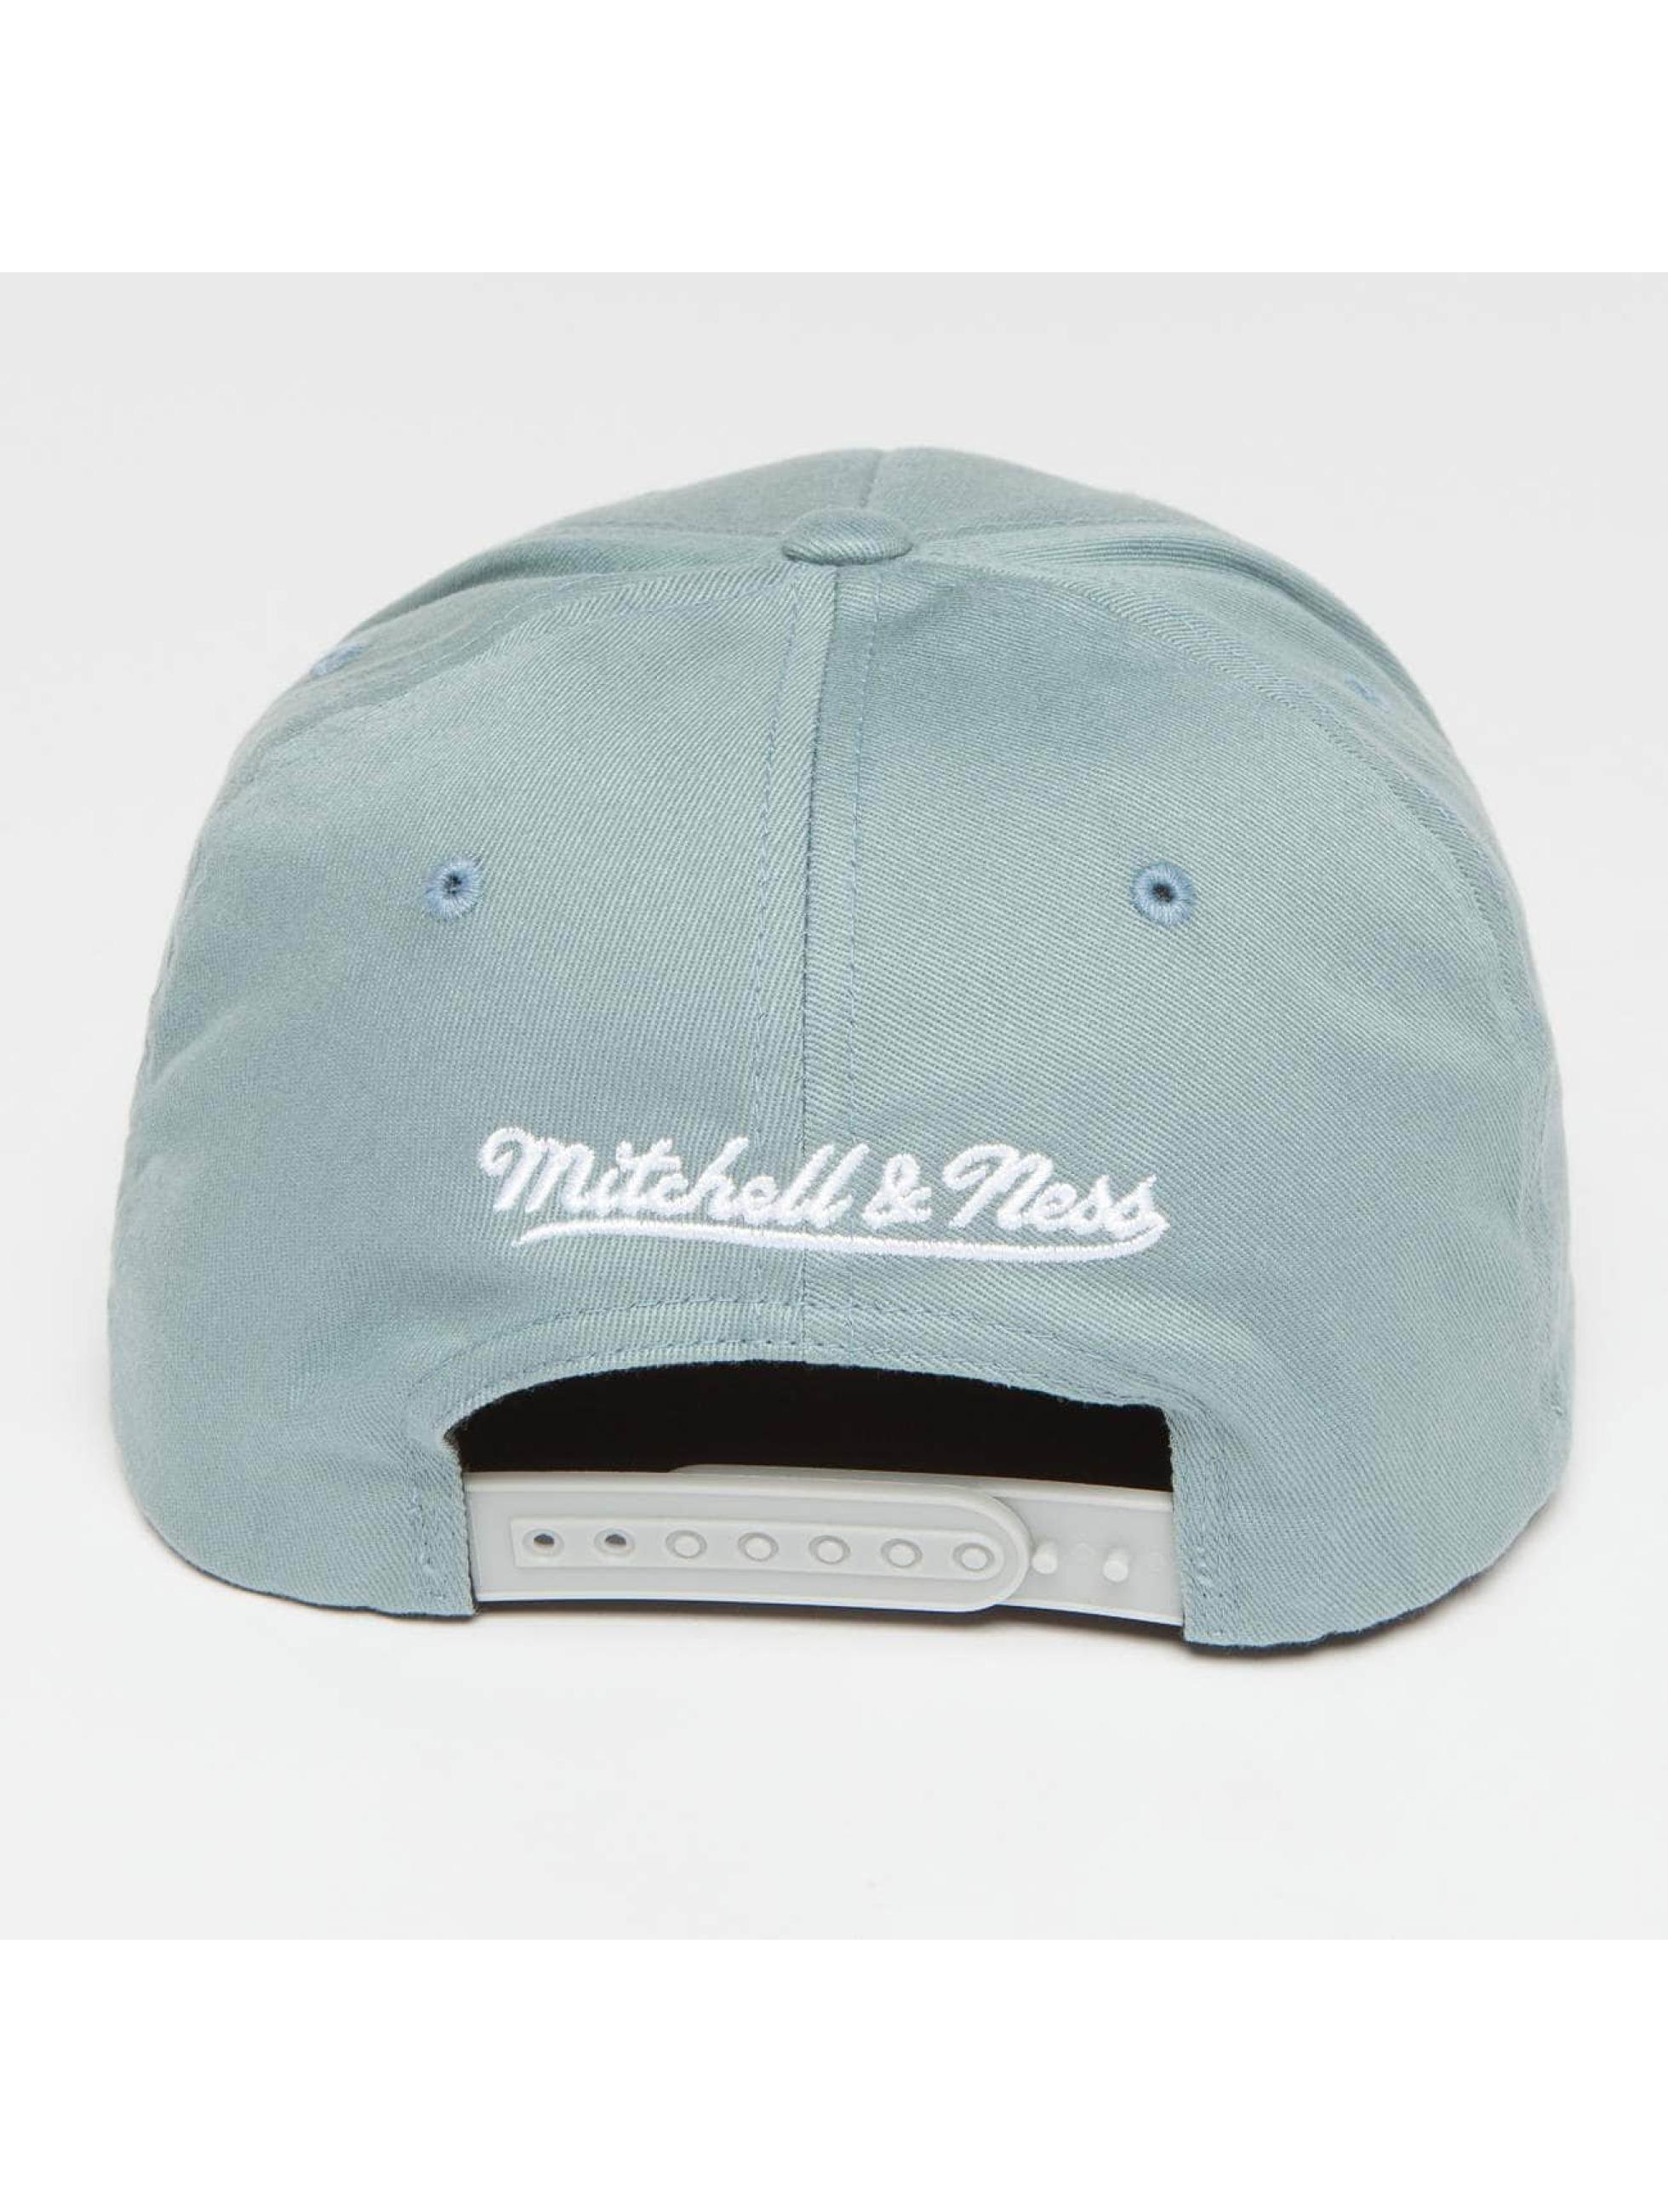 Mitchell & Ness Snapback Cap Own Brand Pinscript High Crown 110 blau